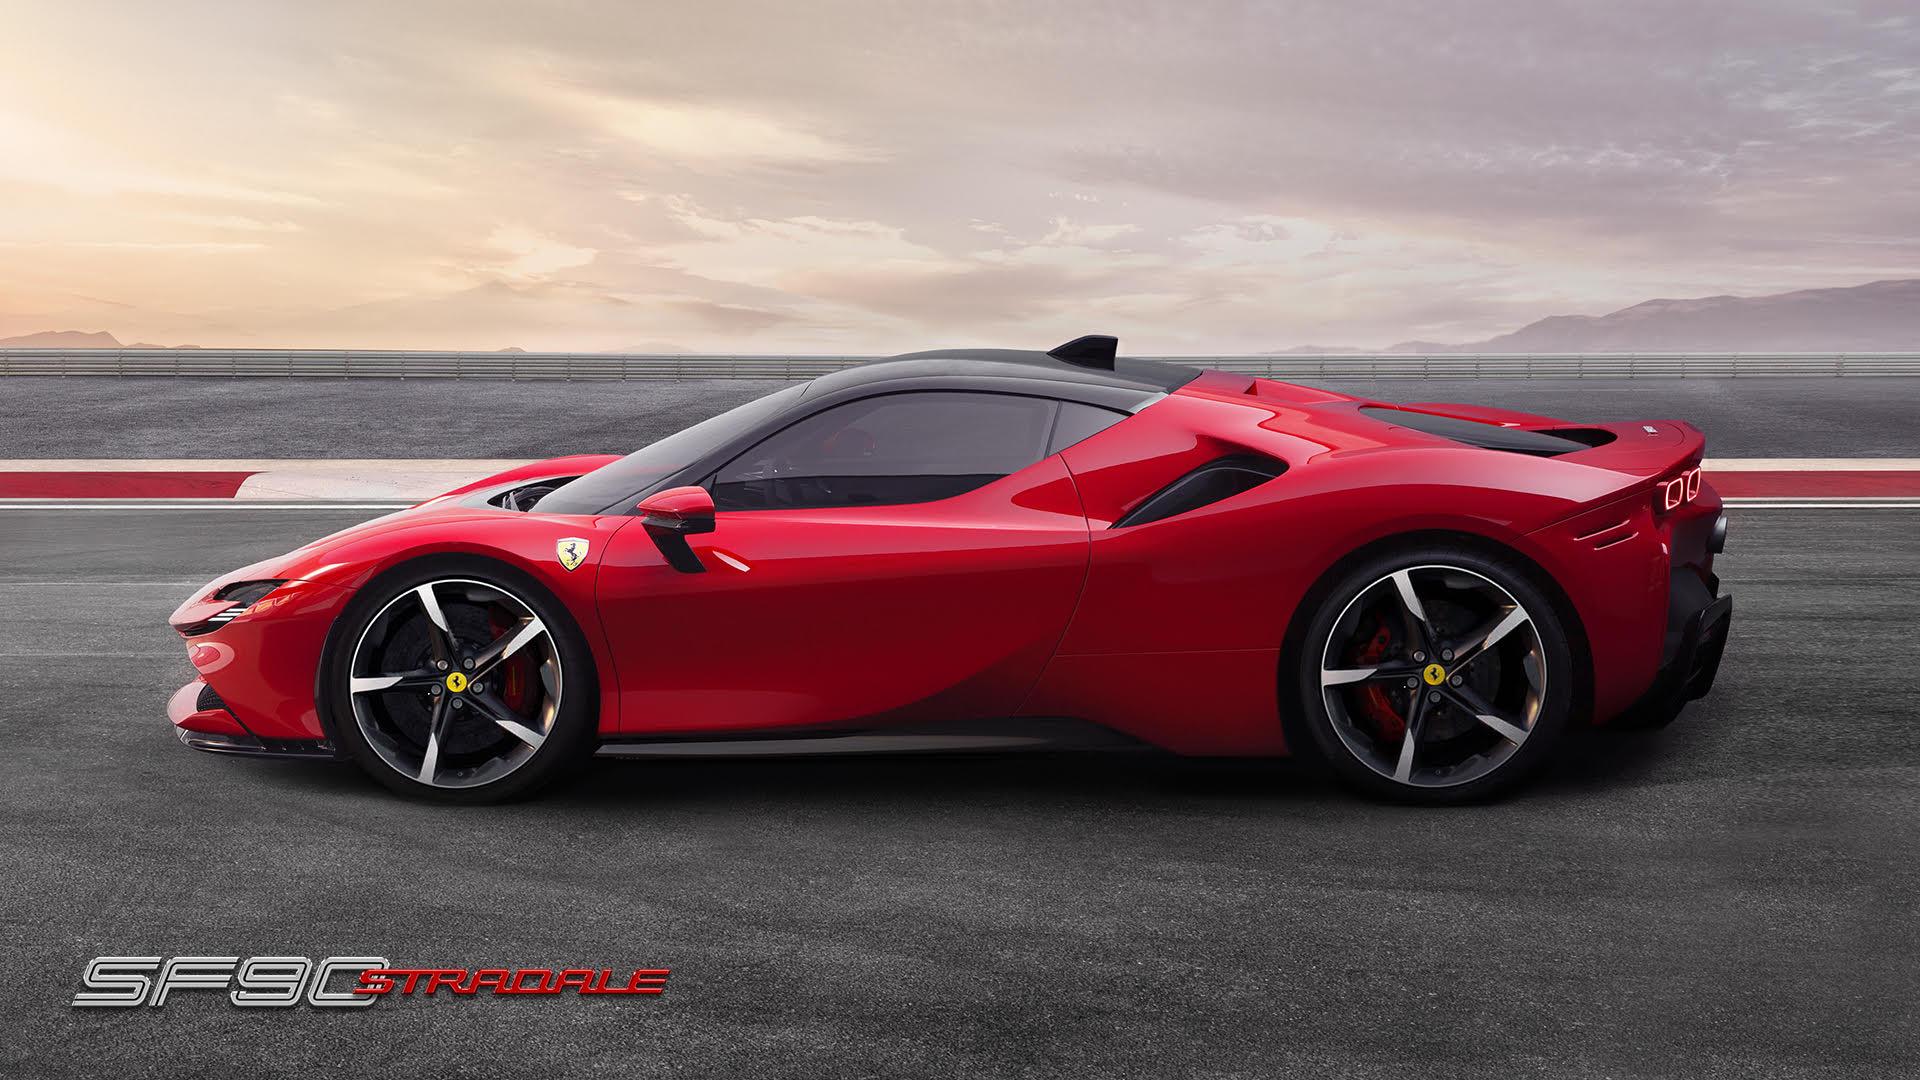 Ferrari S Fastest Production Car Is An Electric Hybrid